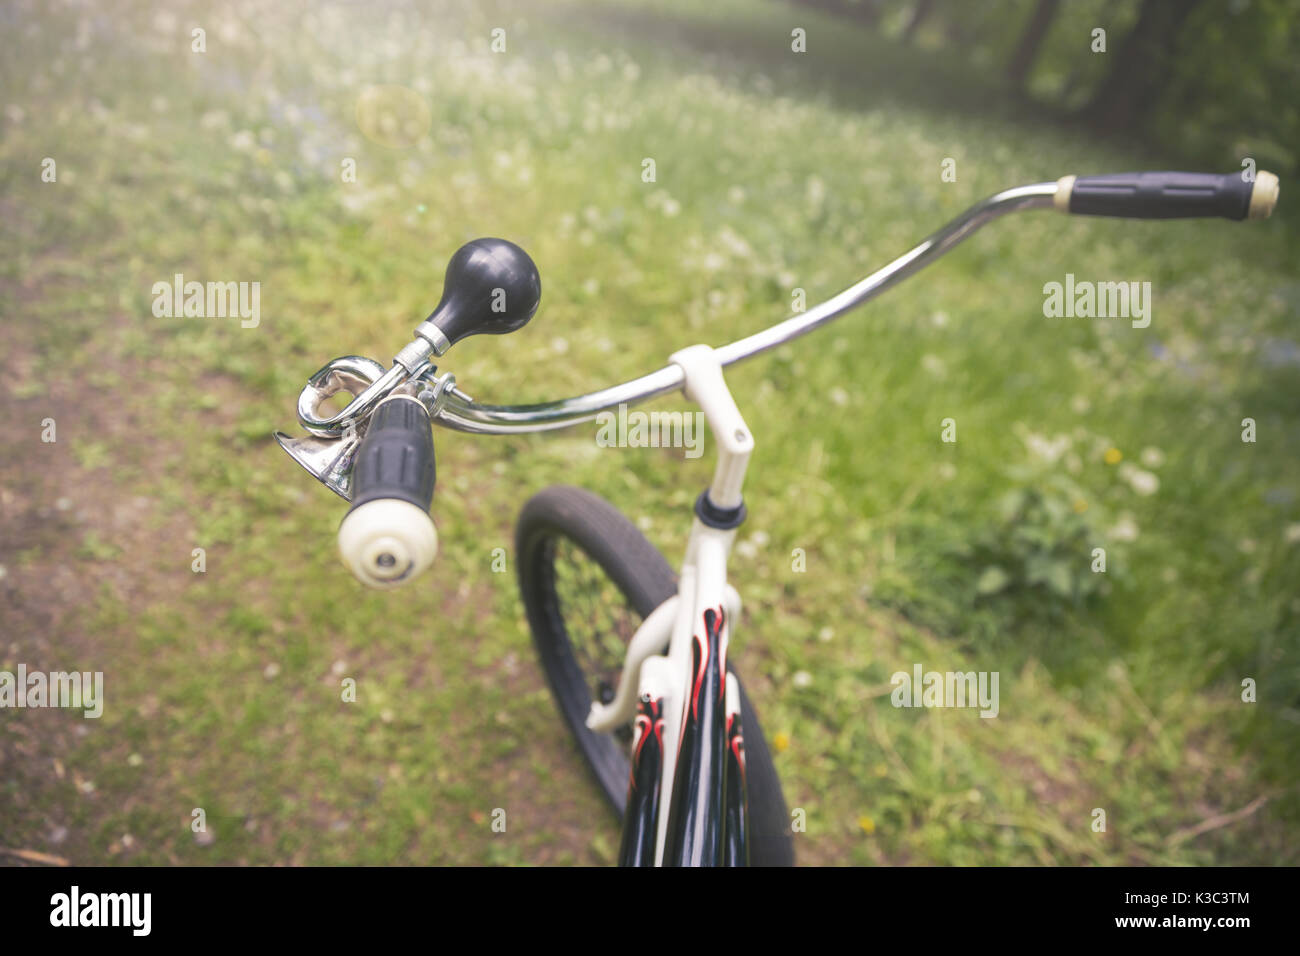 Customized Bicycle Stockfotos & Customized Bicycle Bilder - Alamy